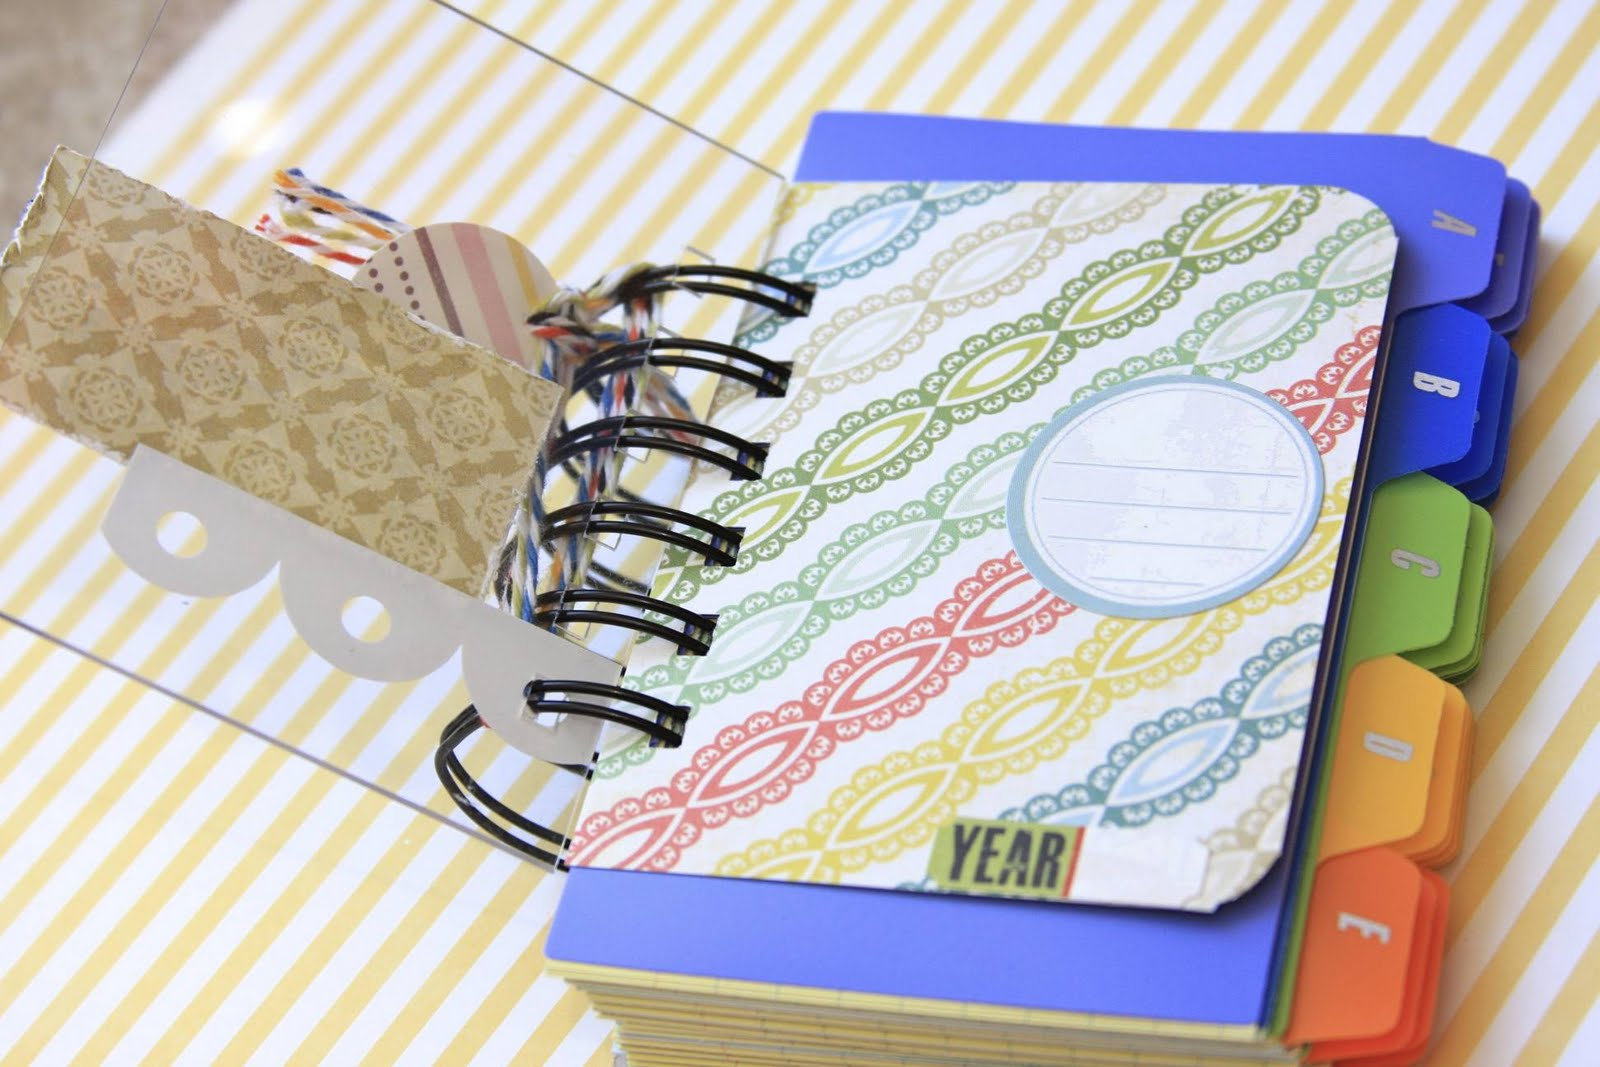 Index Card Password Notebook Tutorial | iloveitallwithmonikawright.com